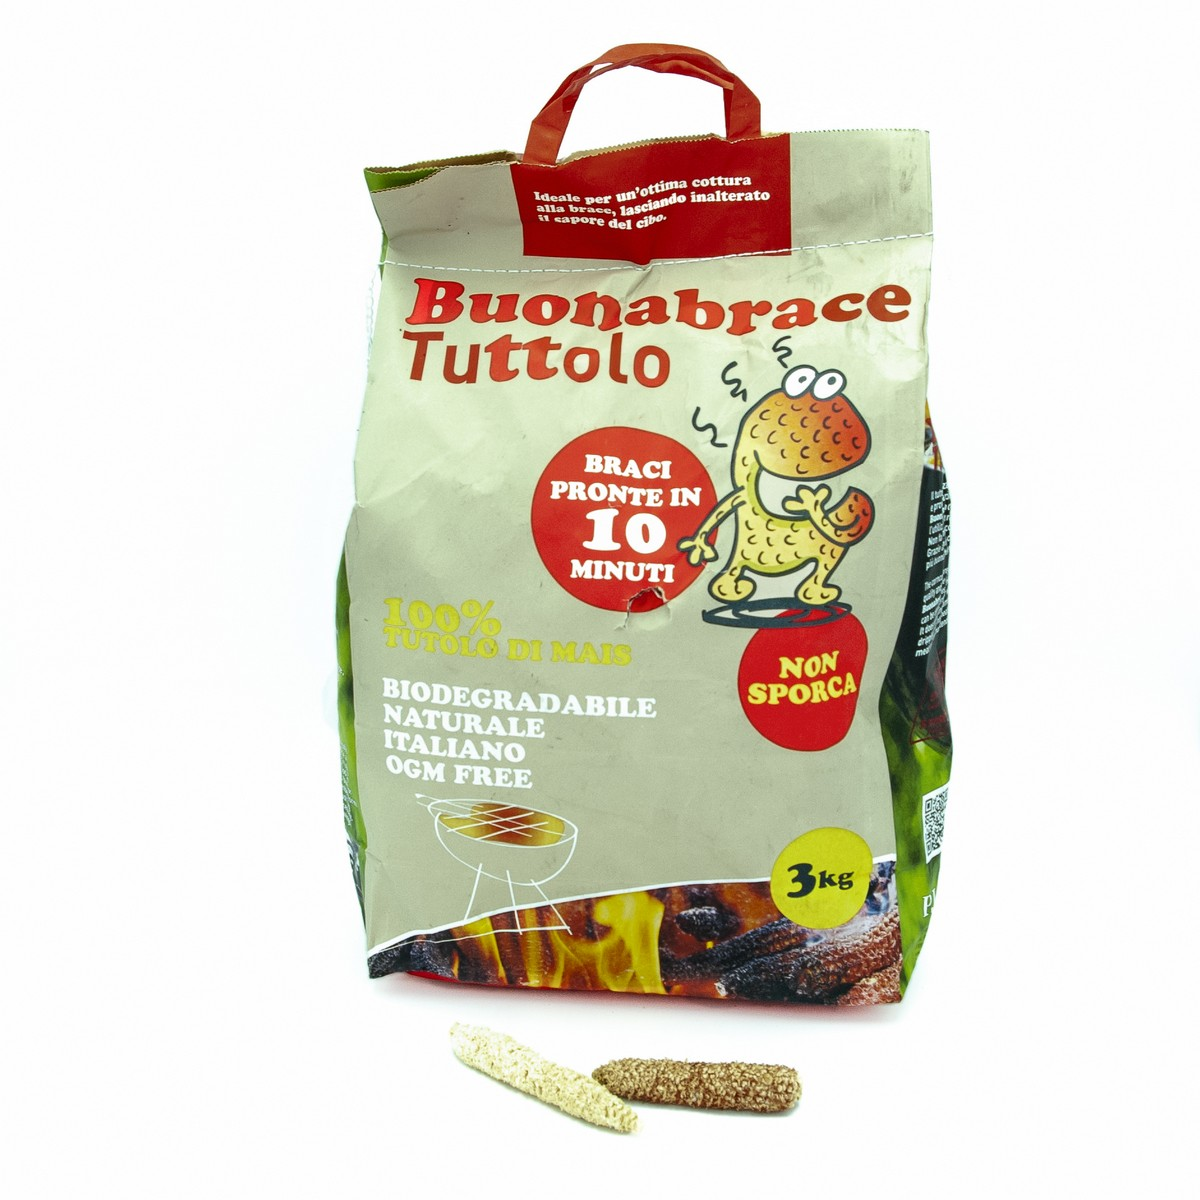 https://padovaniangelo.it/wp-content/uploads/2020/08/accessori-tutolodimais-kg3.jpg